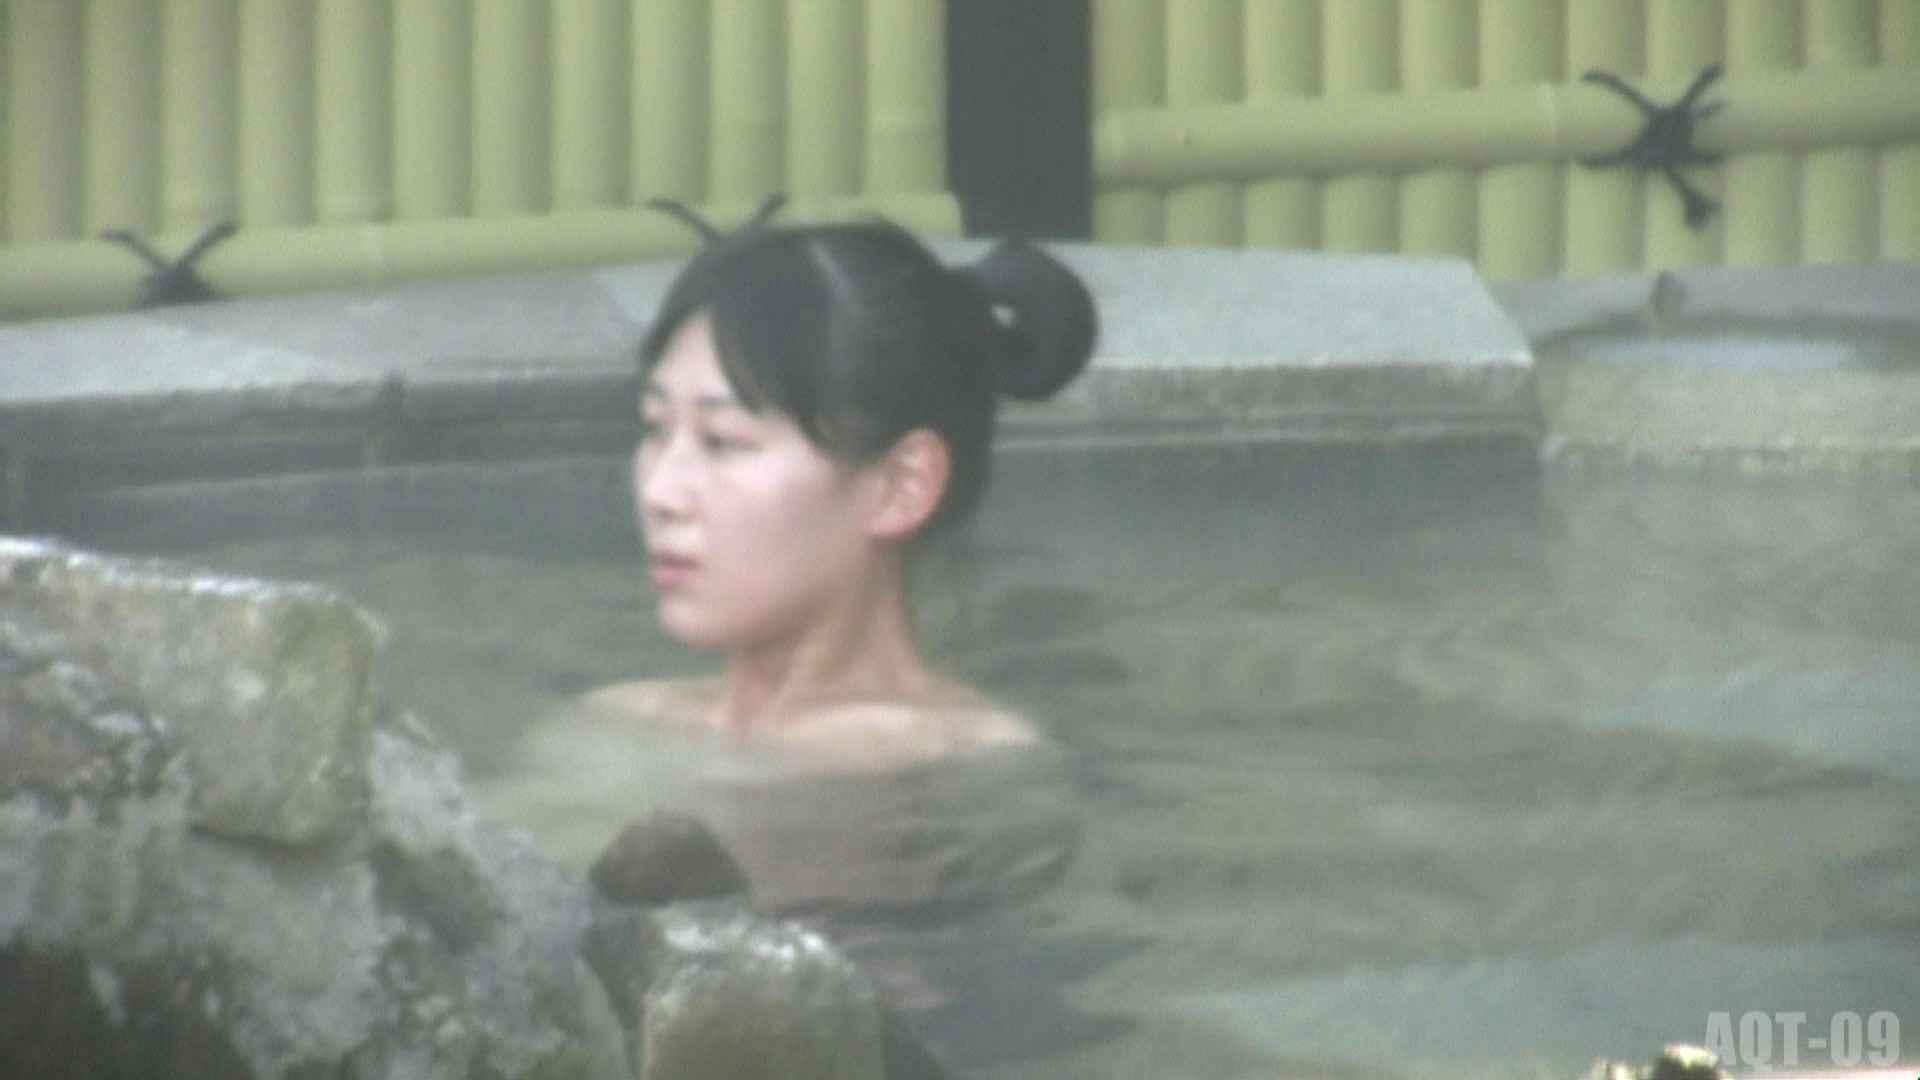 Aquaな露天風呂Vol.785 盗撮師作品 オメコ無修正動画無料 84pic 62